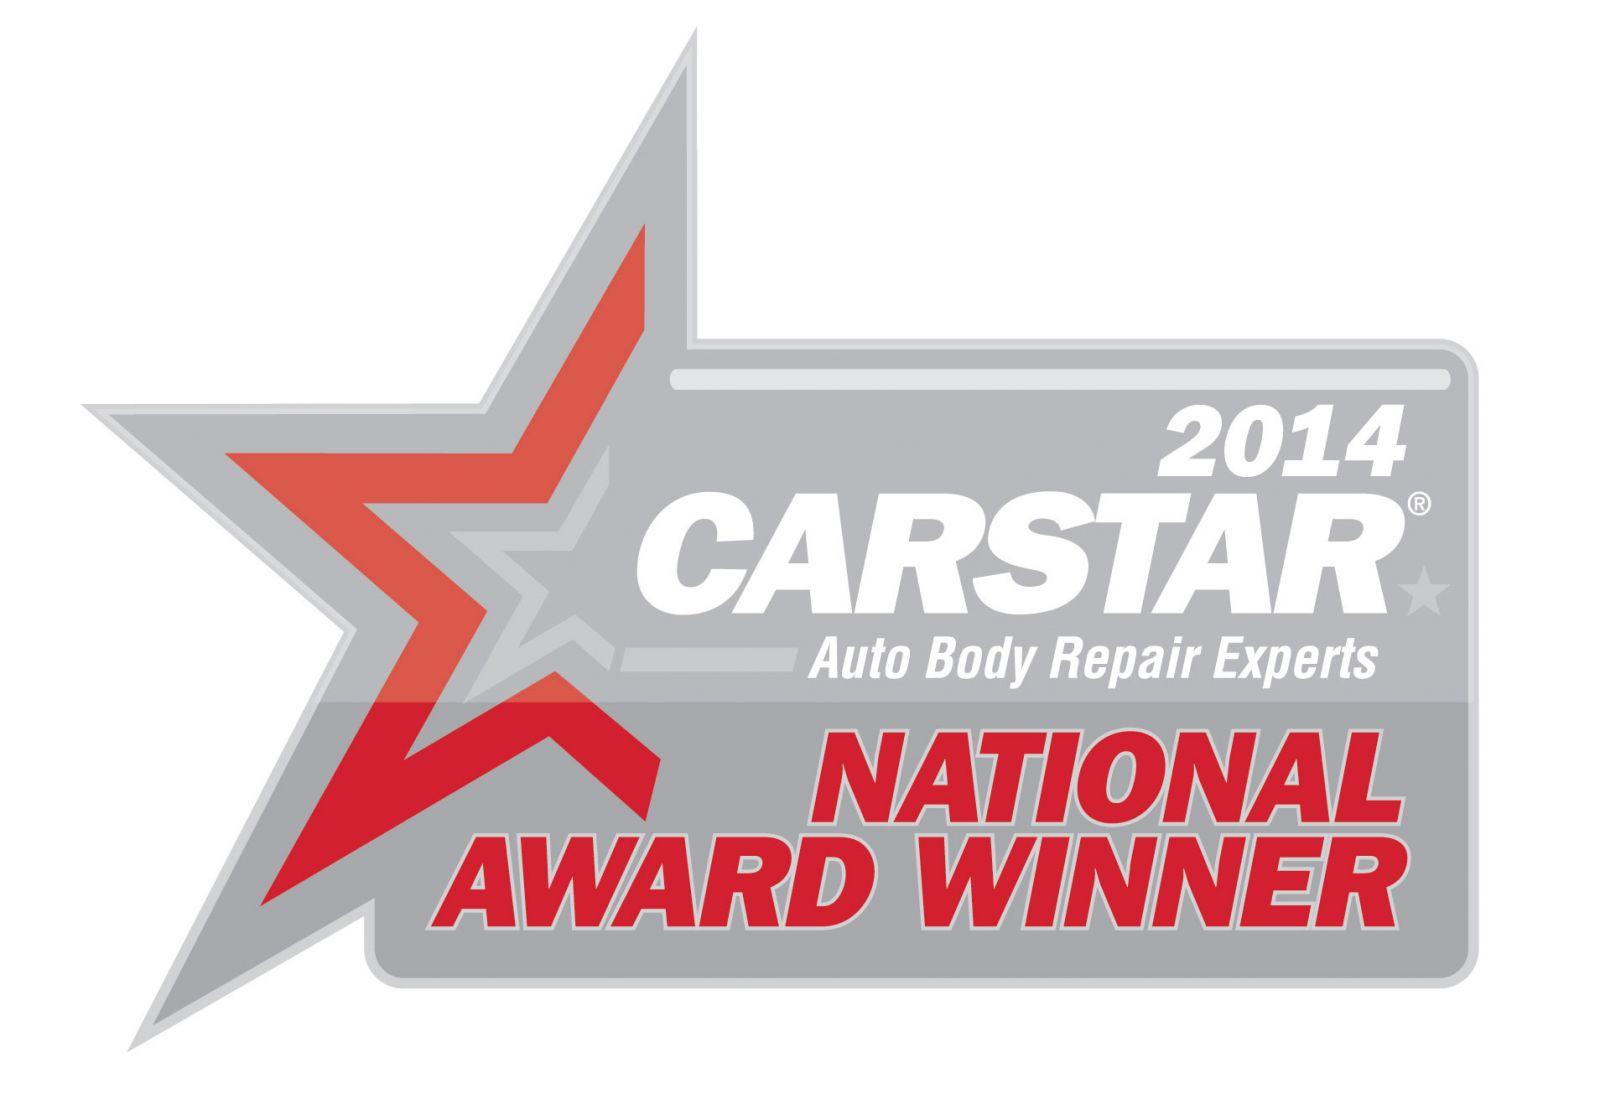 Carstar | Sidney CARSTAR: 2014 National Award Winner